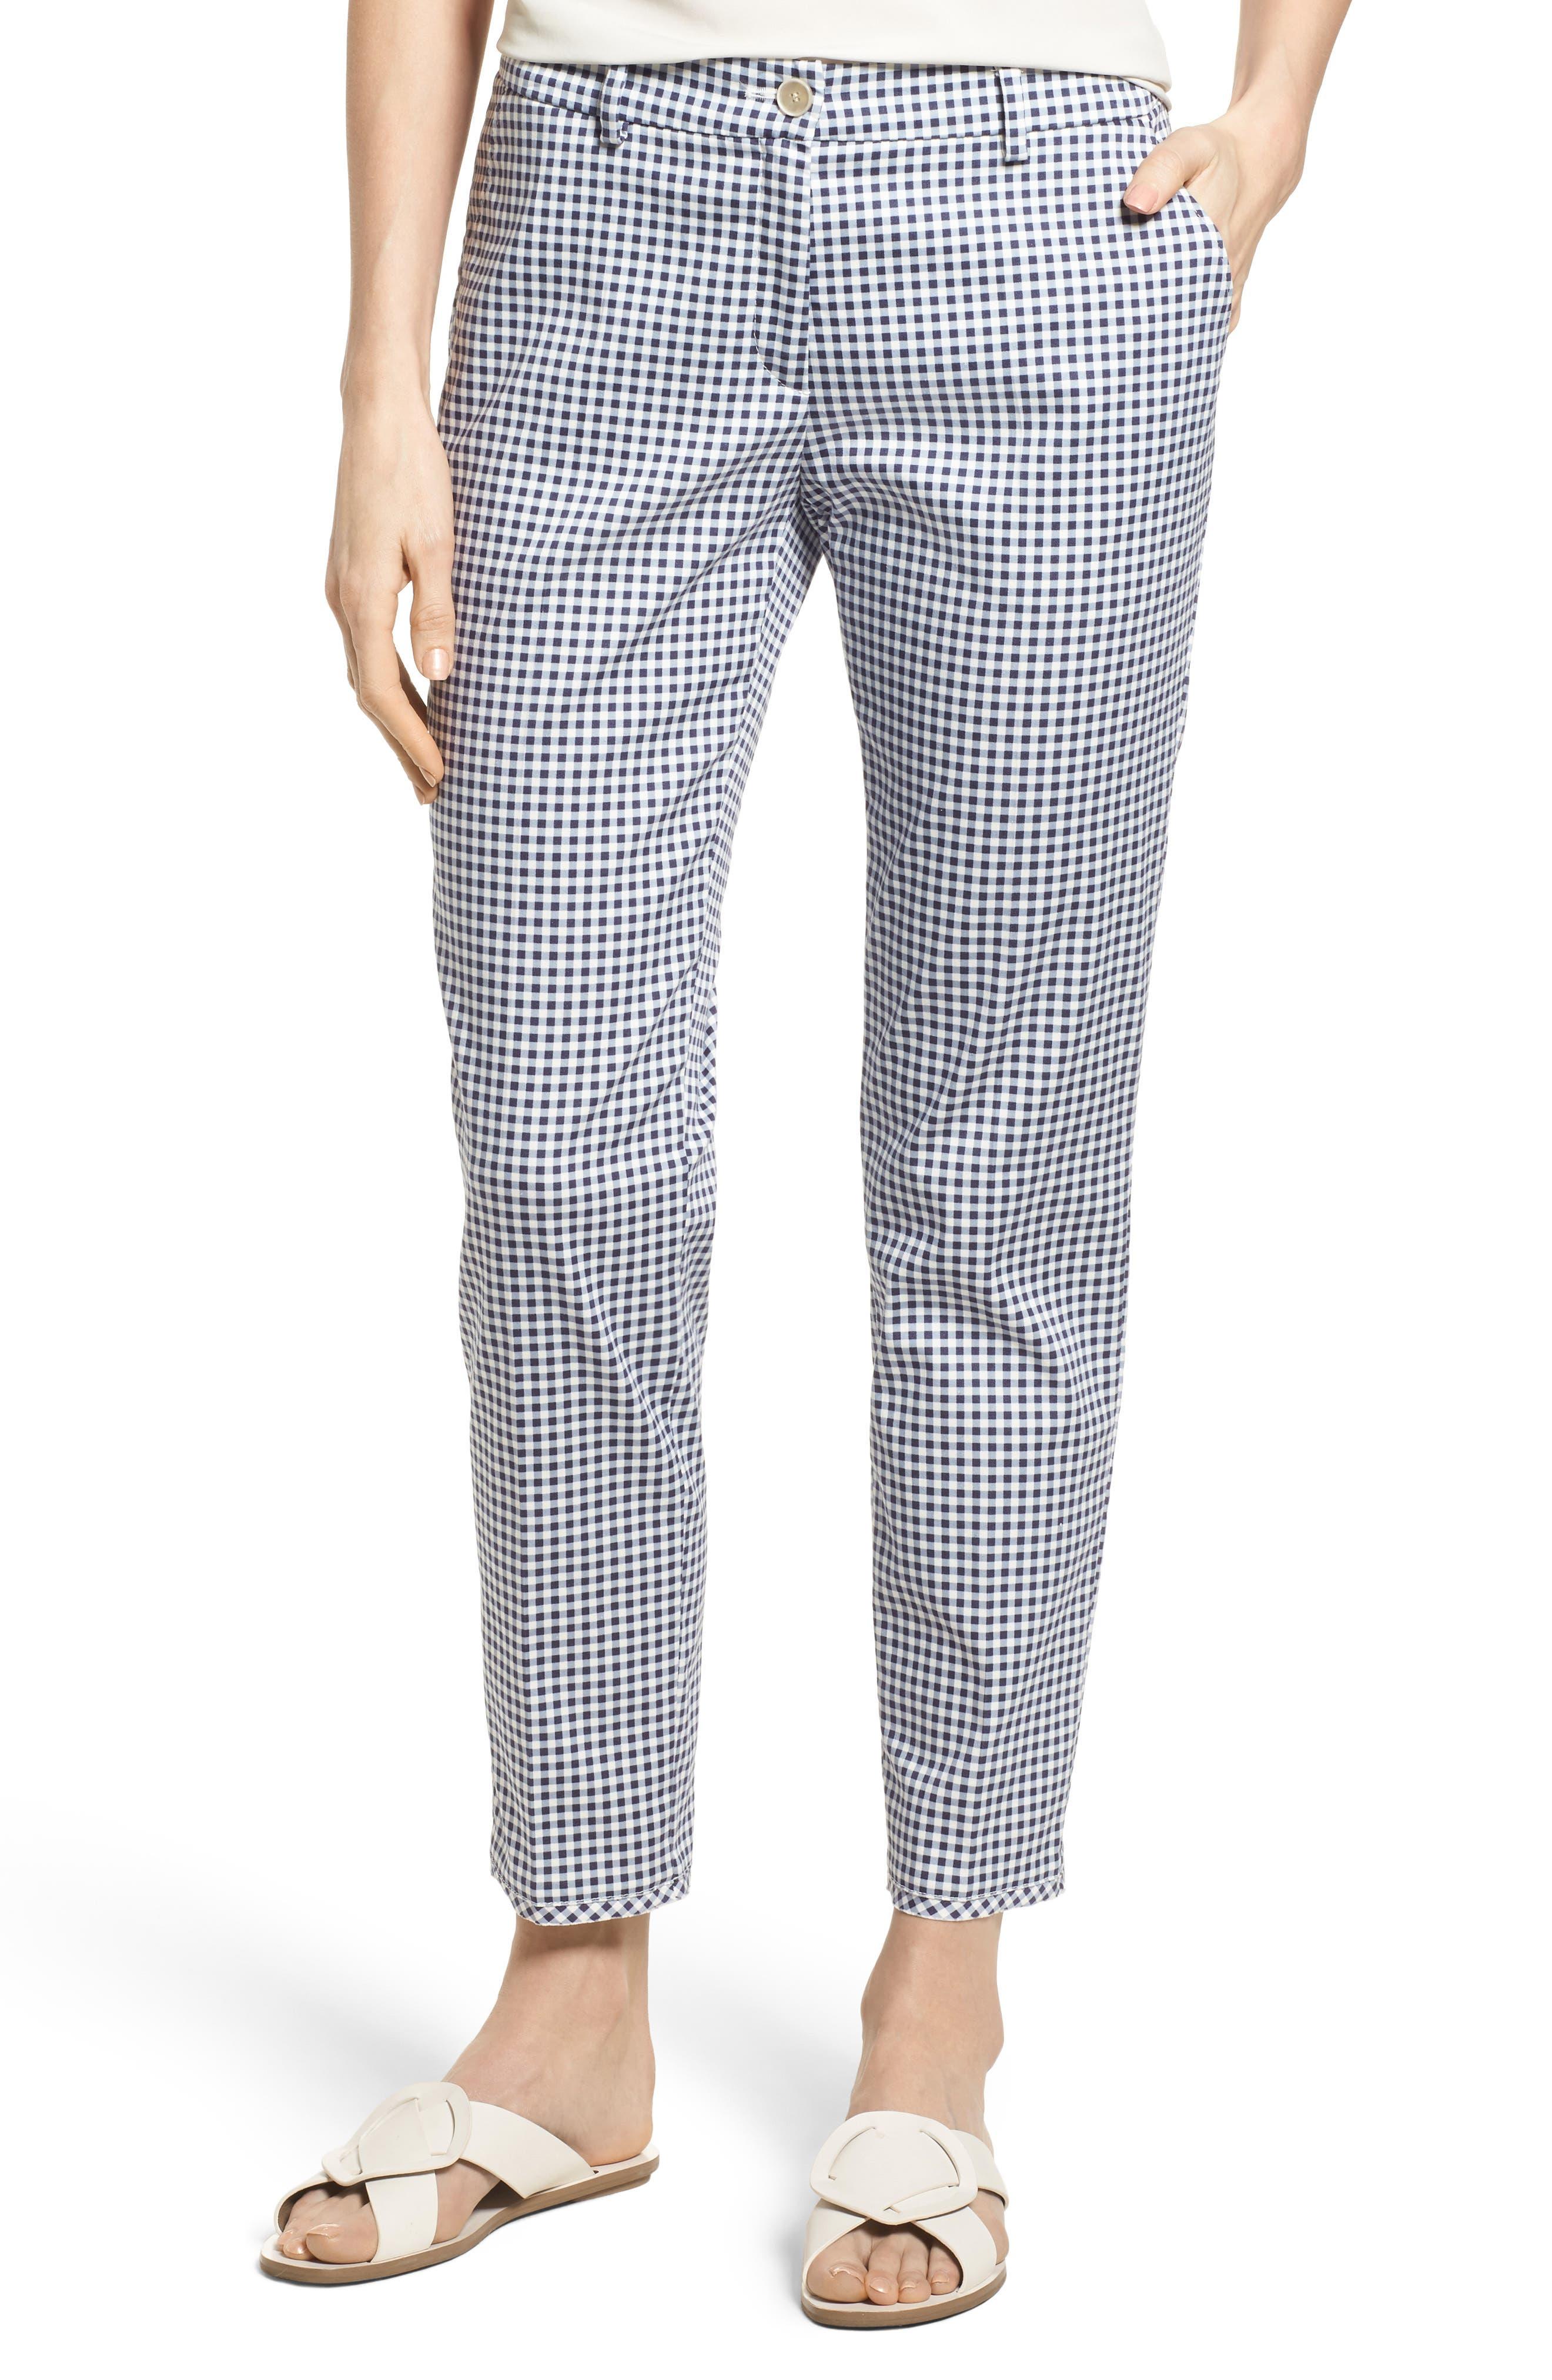 Maron Gingham Stretch Cotton Pants,                         Main,                         color, OCEAN